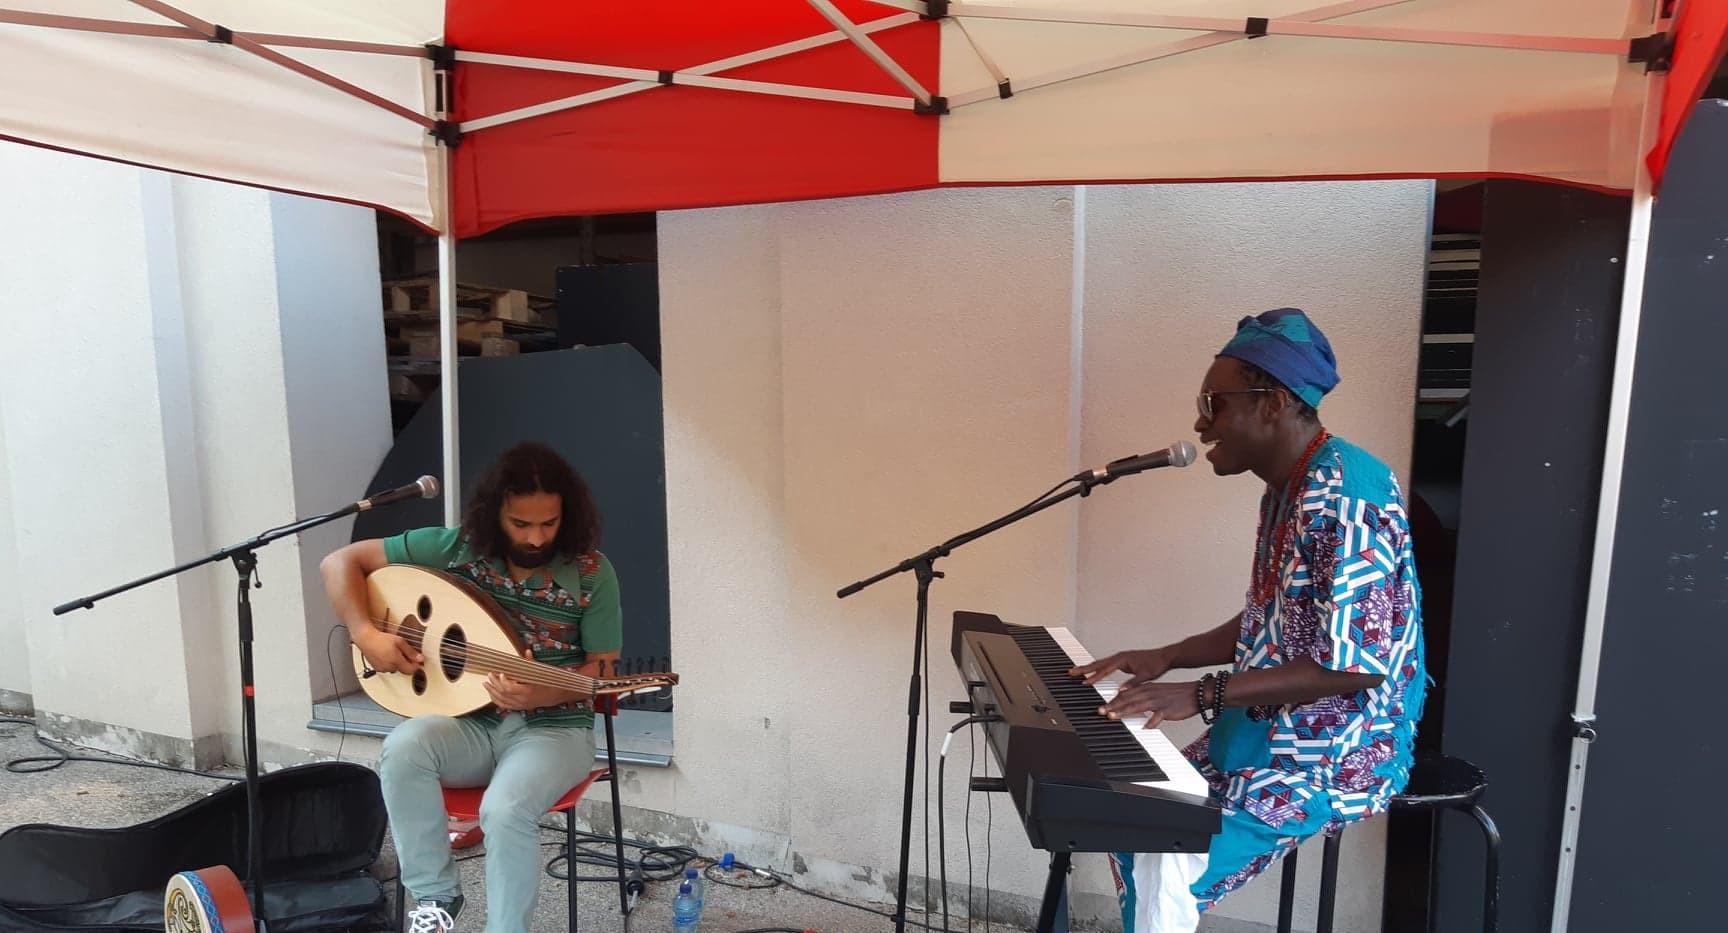 concert Homelands Maison des Cultures Summer 2020